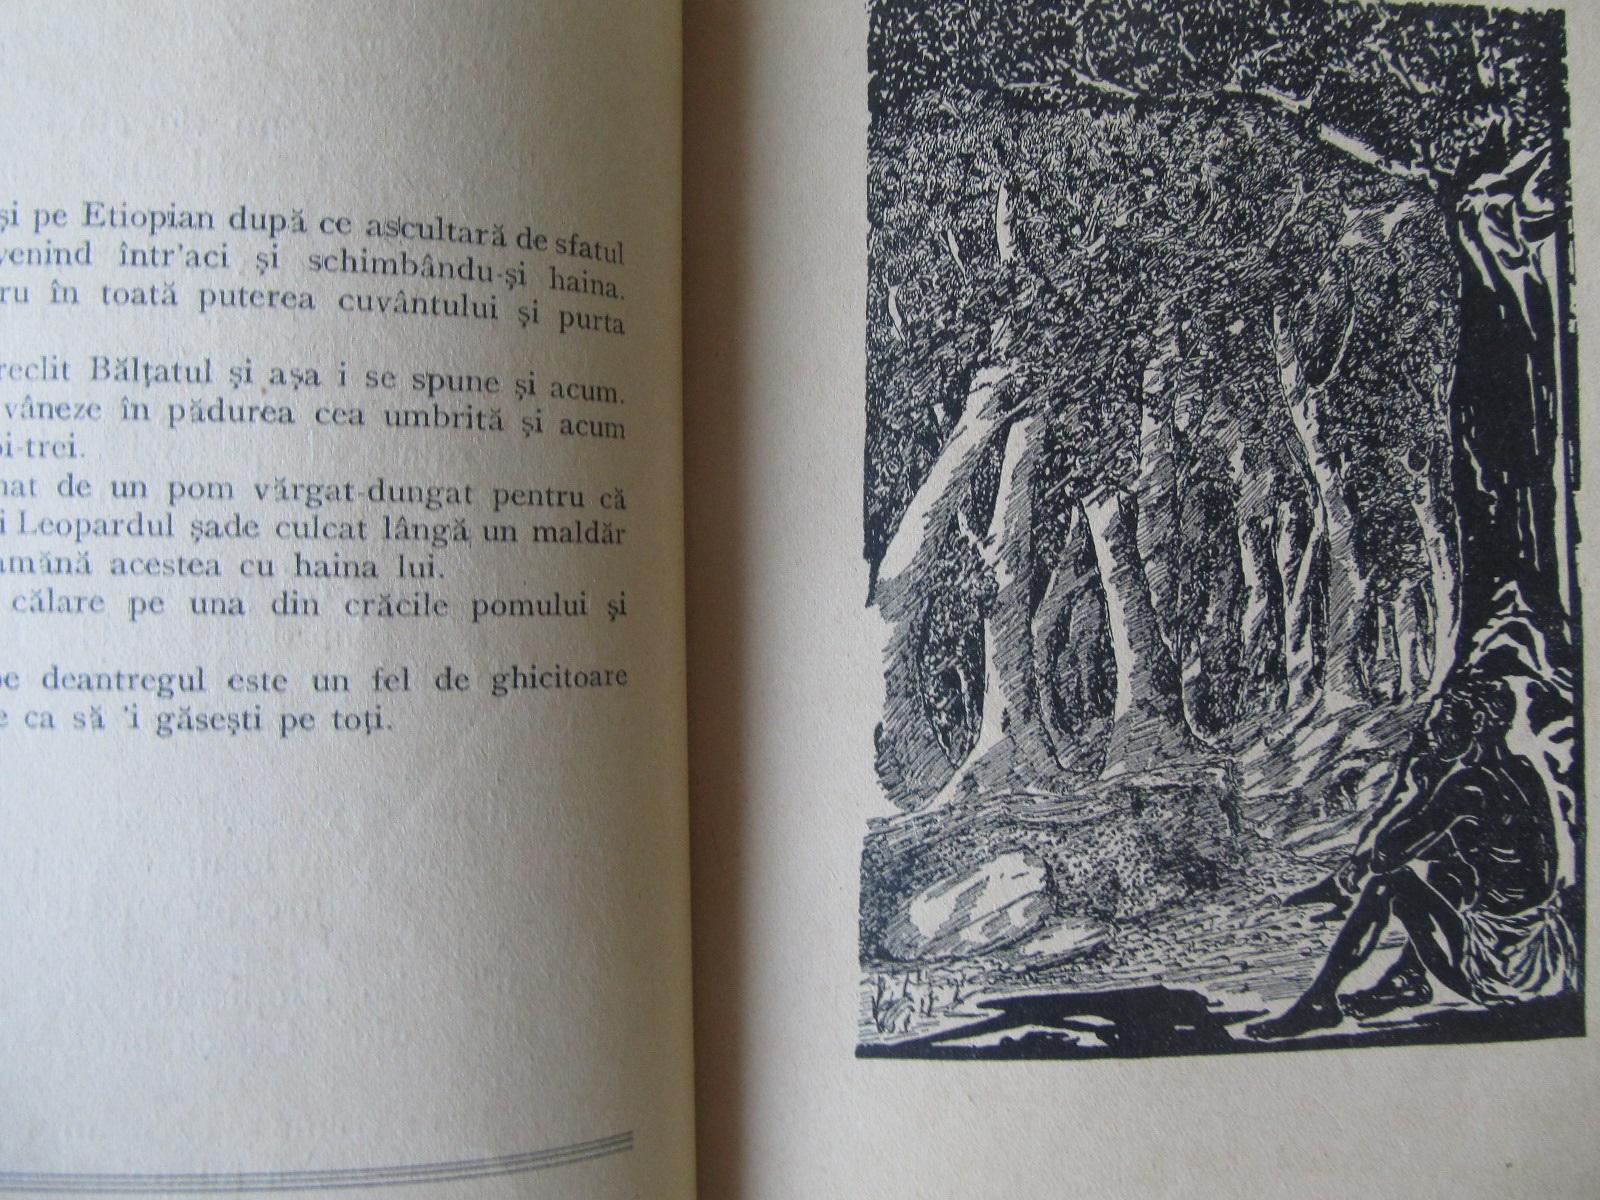 Carte Pe vremea cand animalele vorbeau , 1939 - Rudyard Kipling